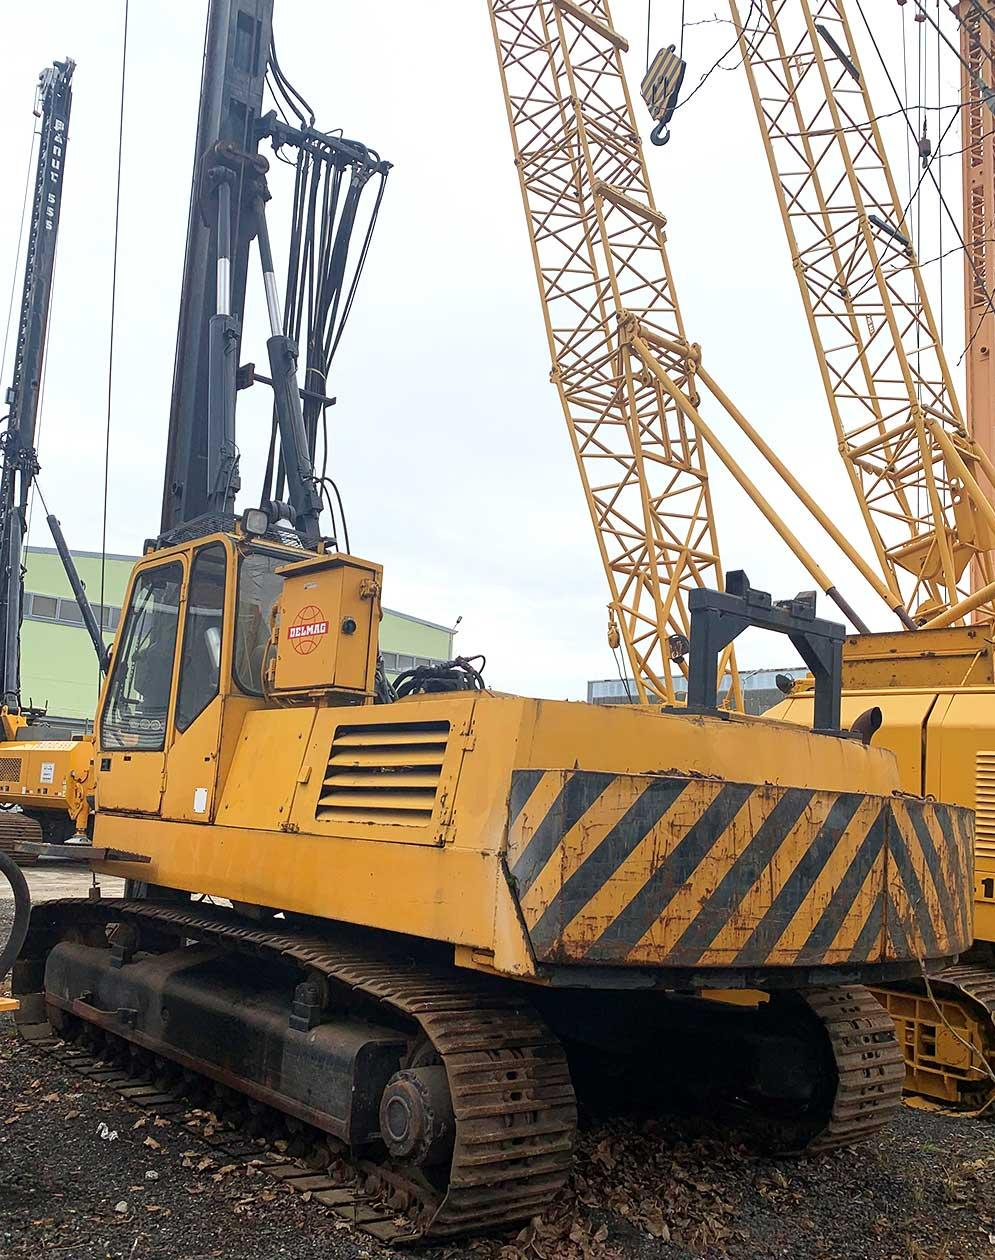 Foundation drilling rig DELMAG RH 0912